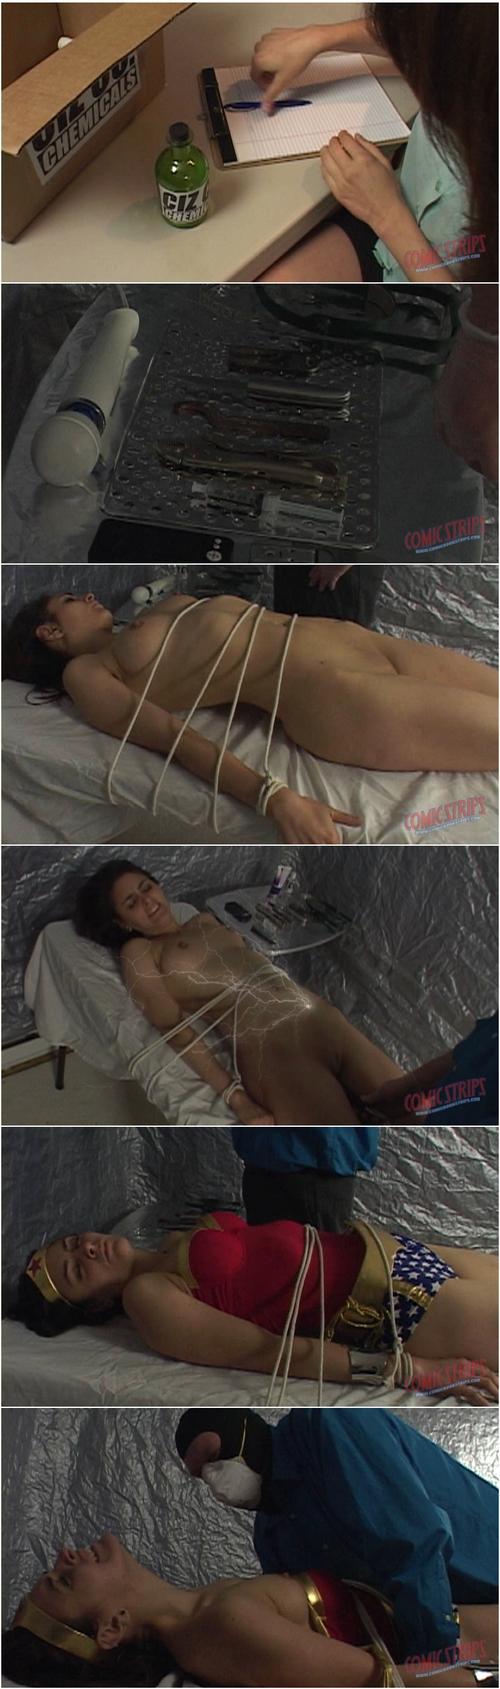 More please Bondage movies maledom what I'm